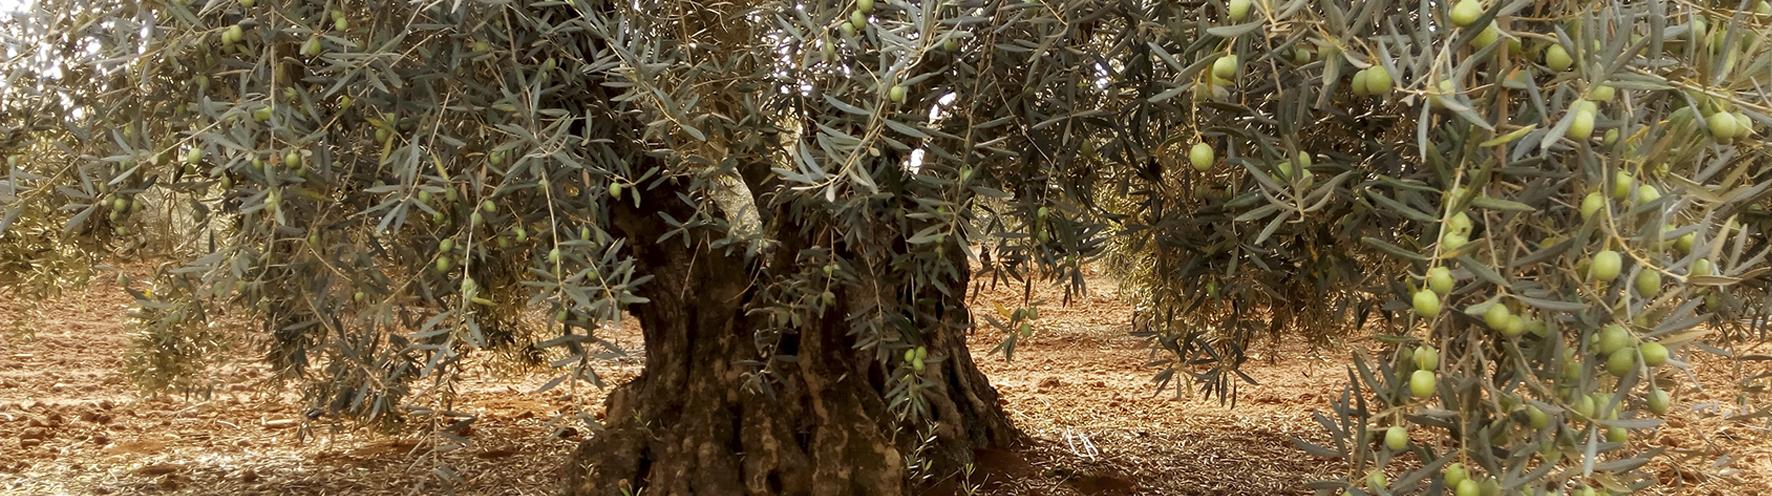 centenial olive tree